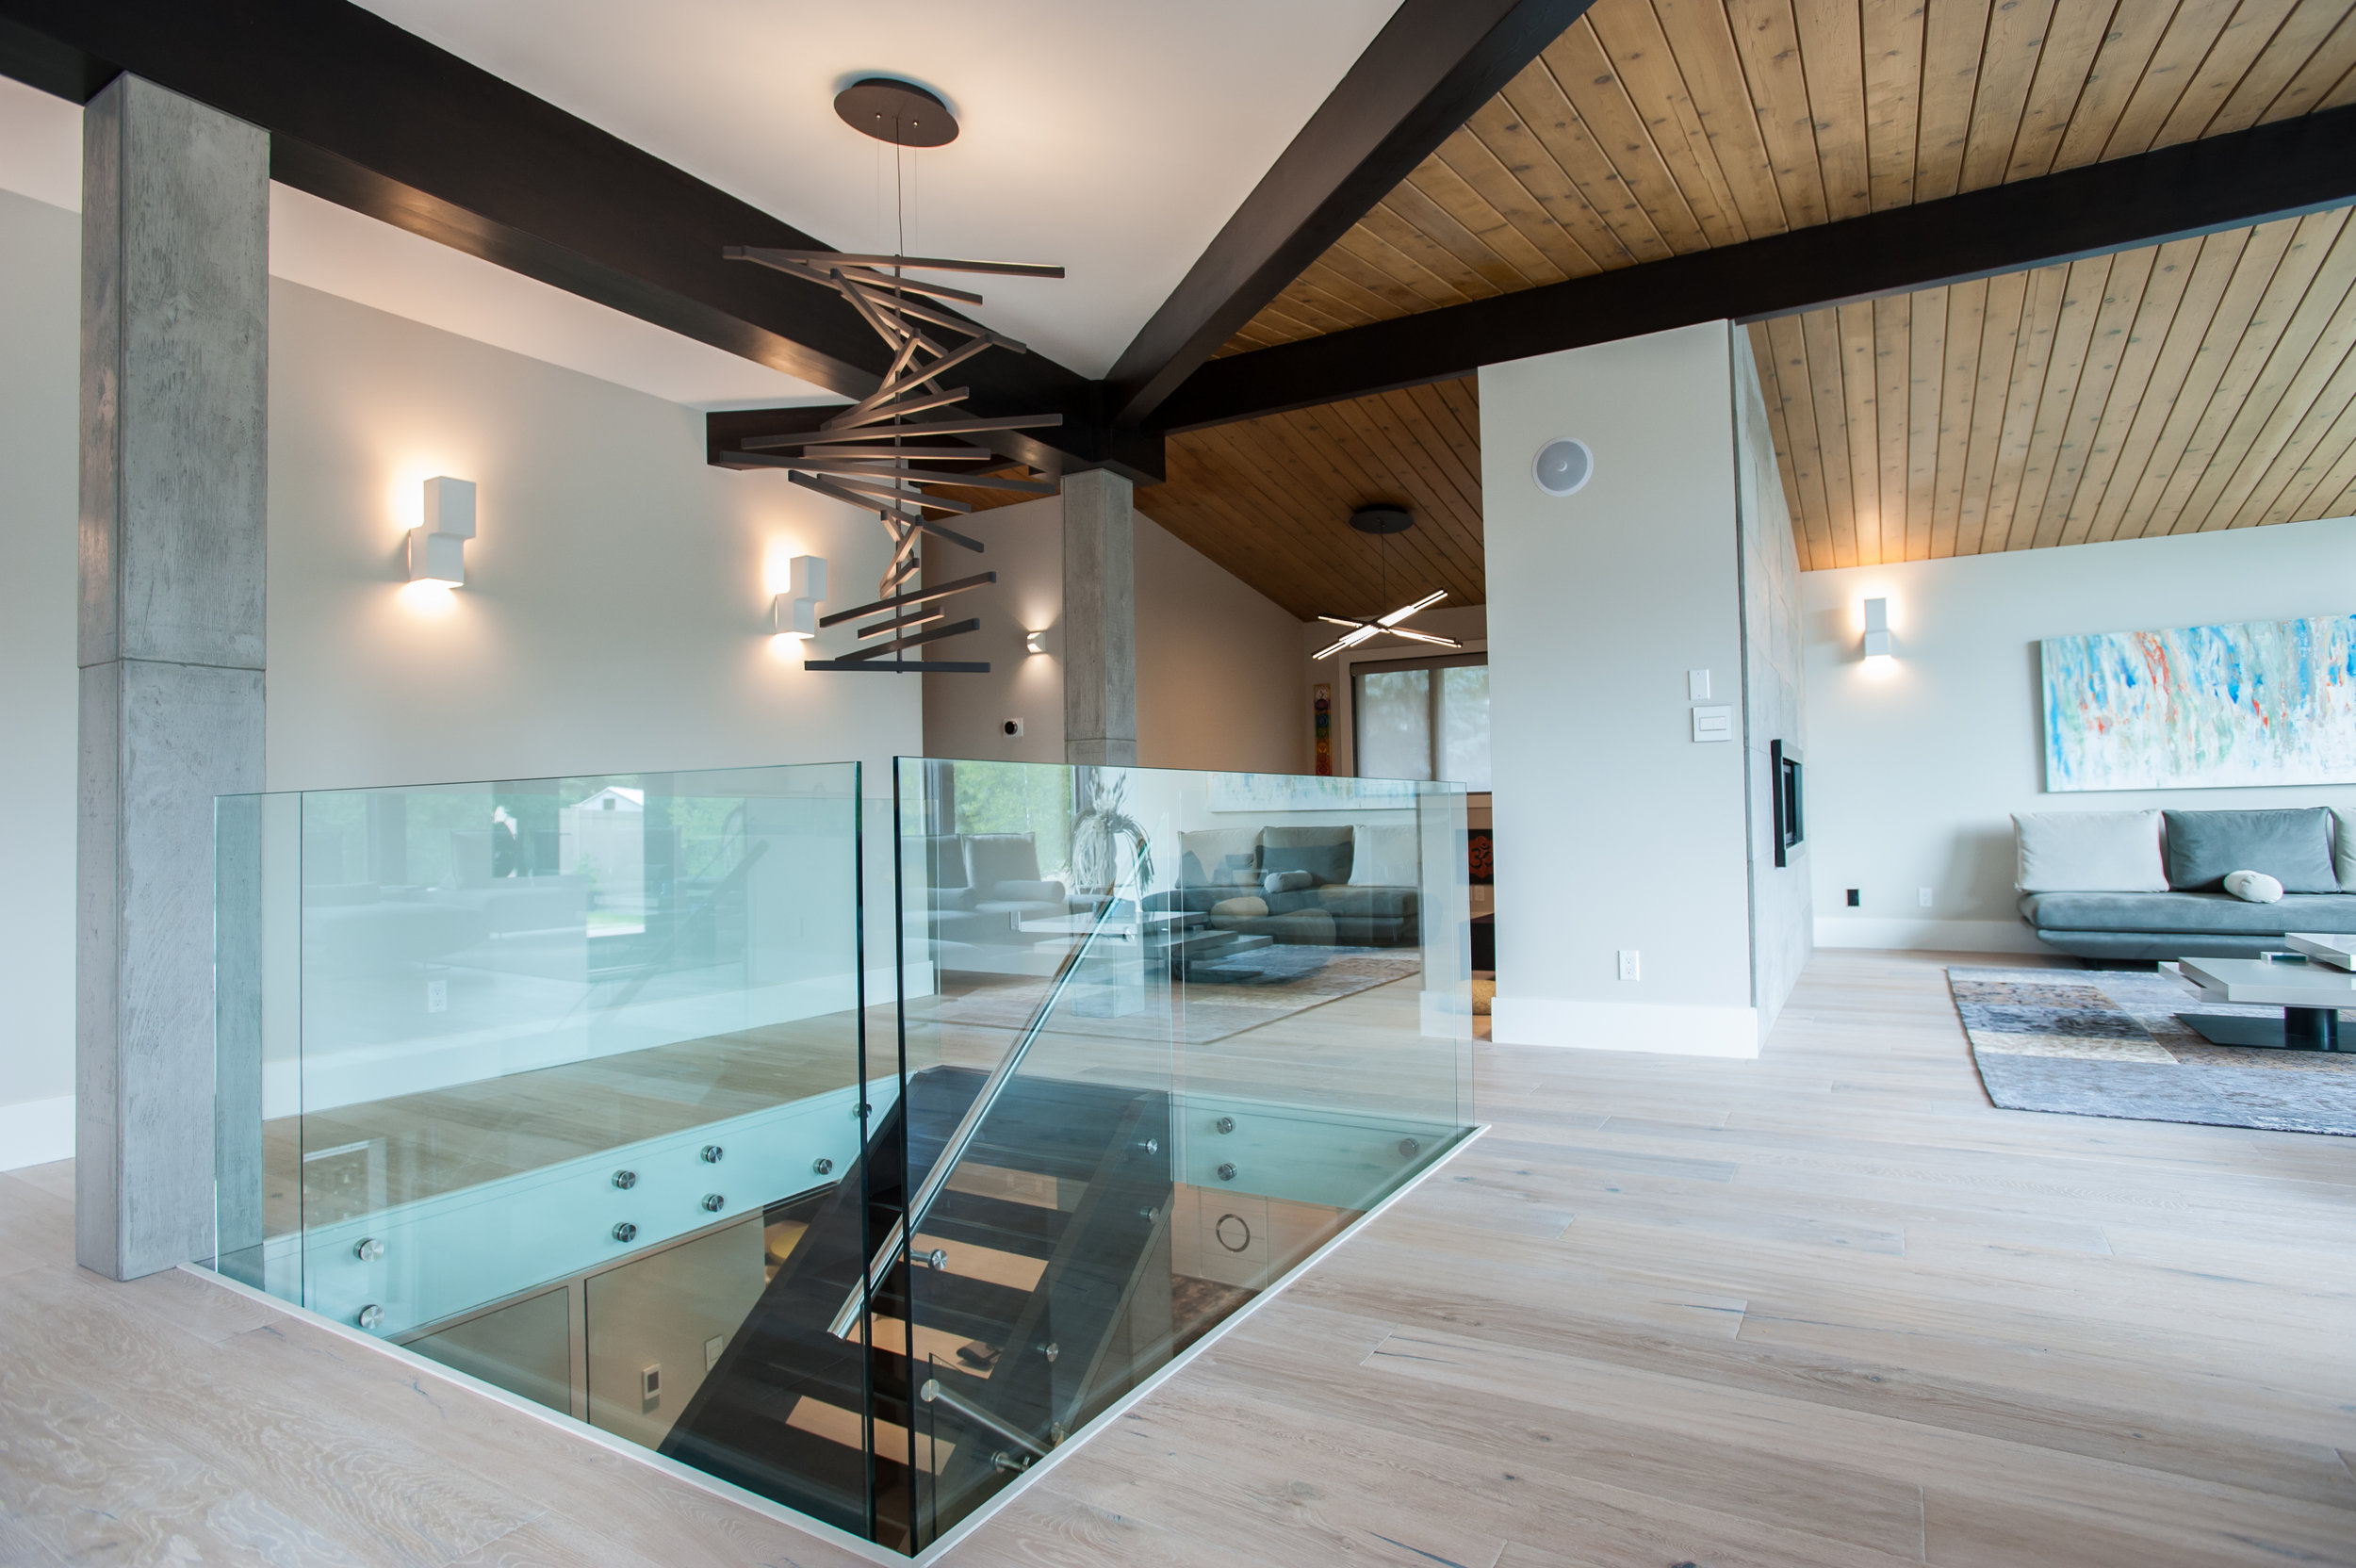 Diamond Contracting & Revolving Rooms Interior Design